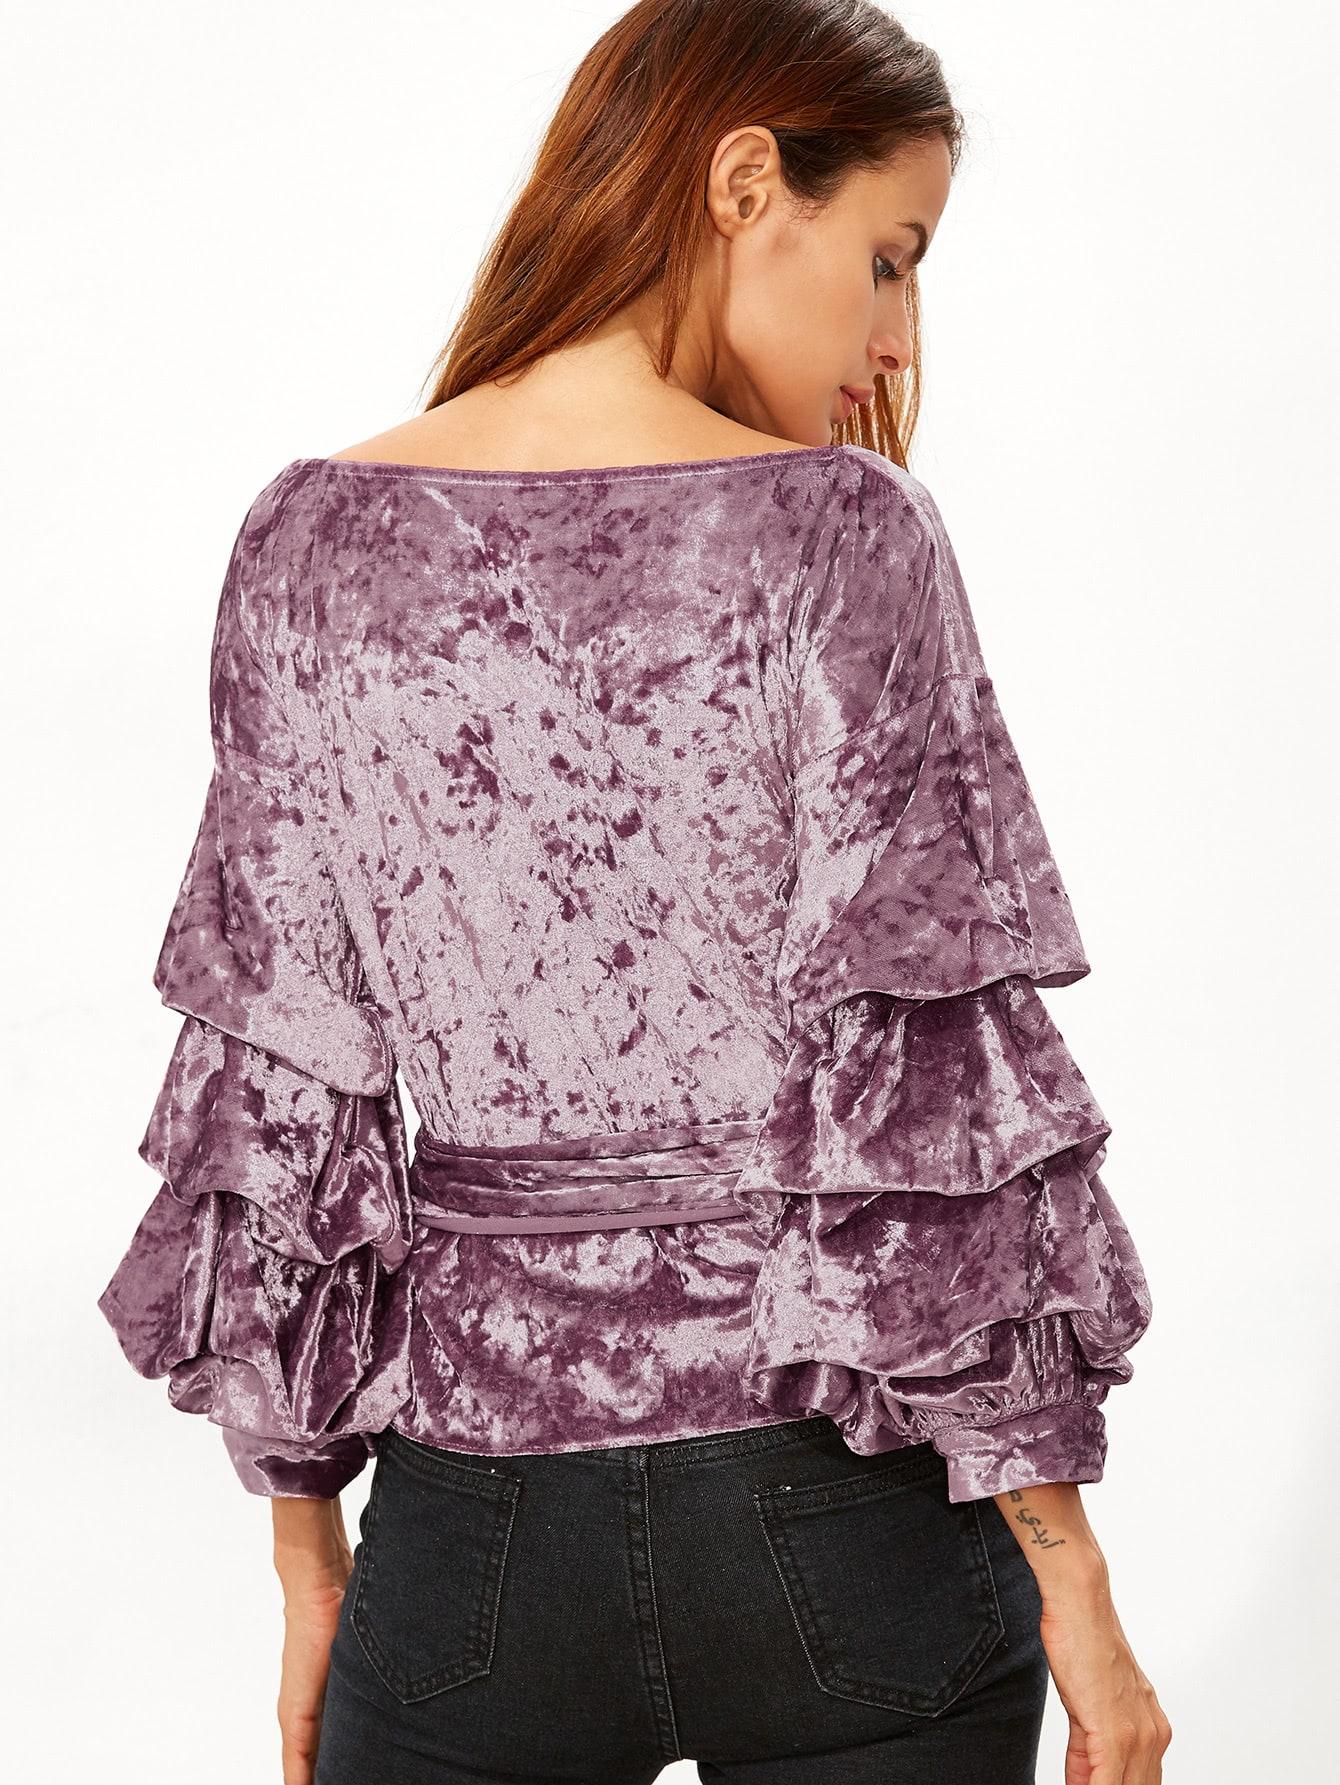 blouse160909702_2